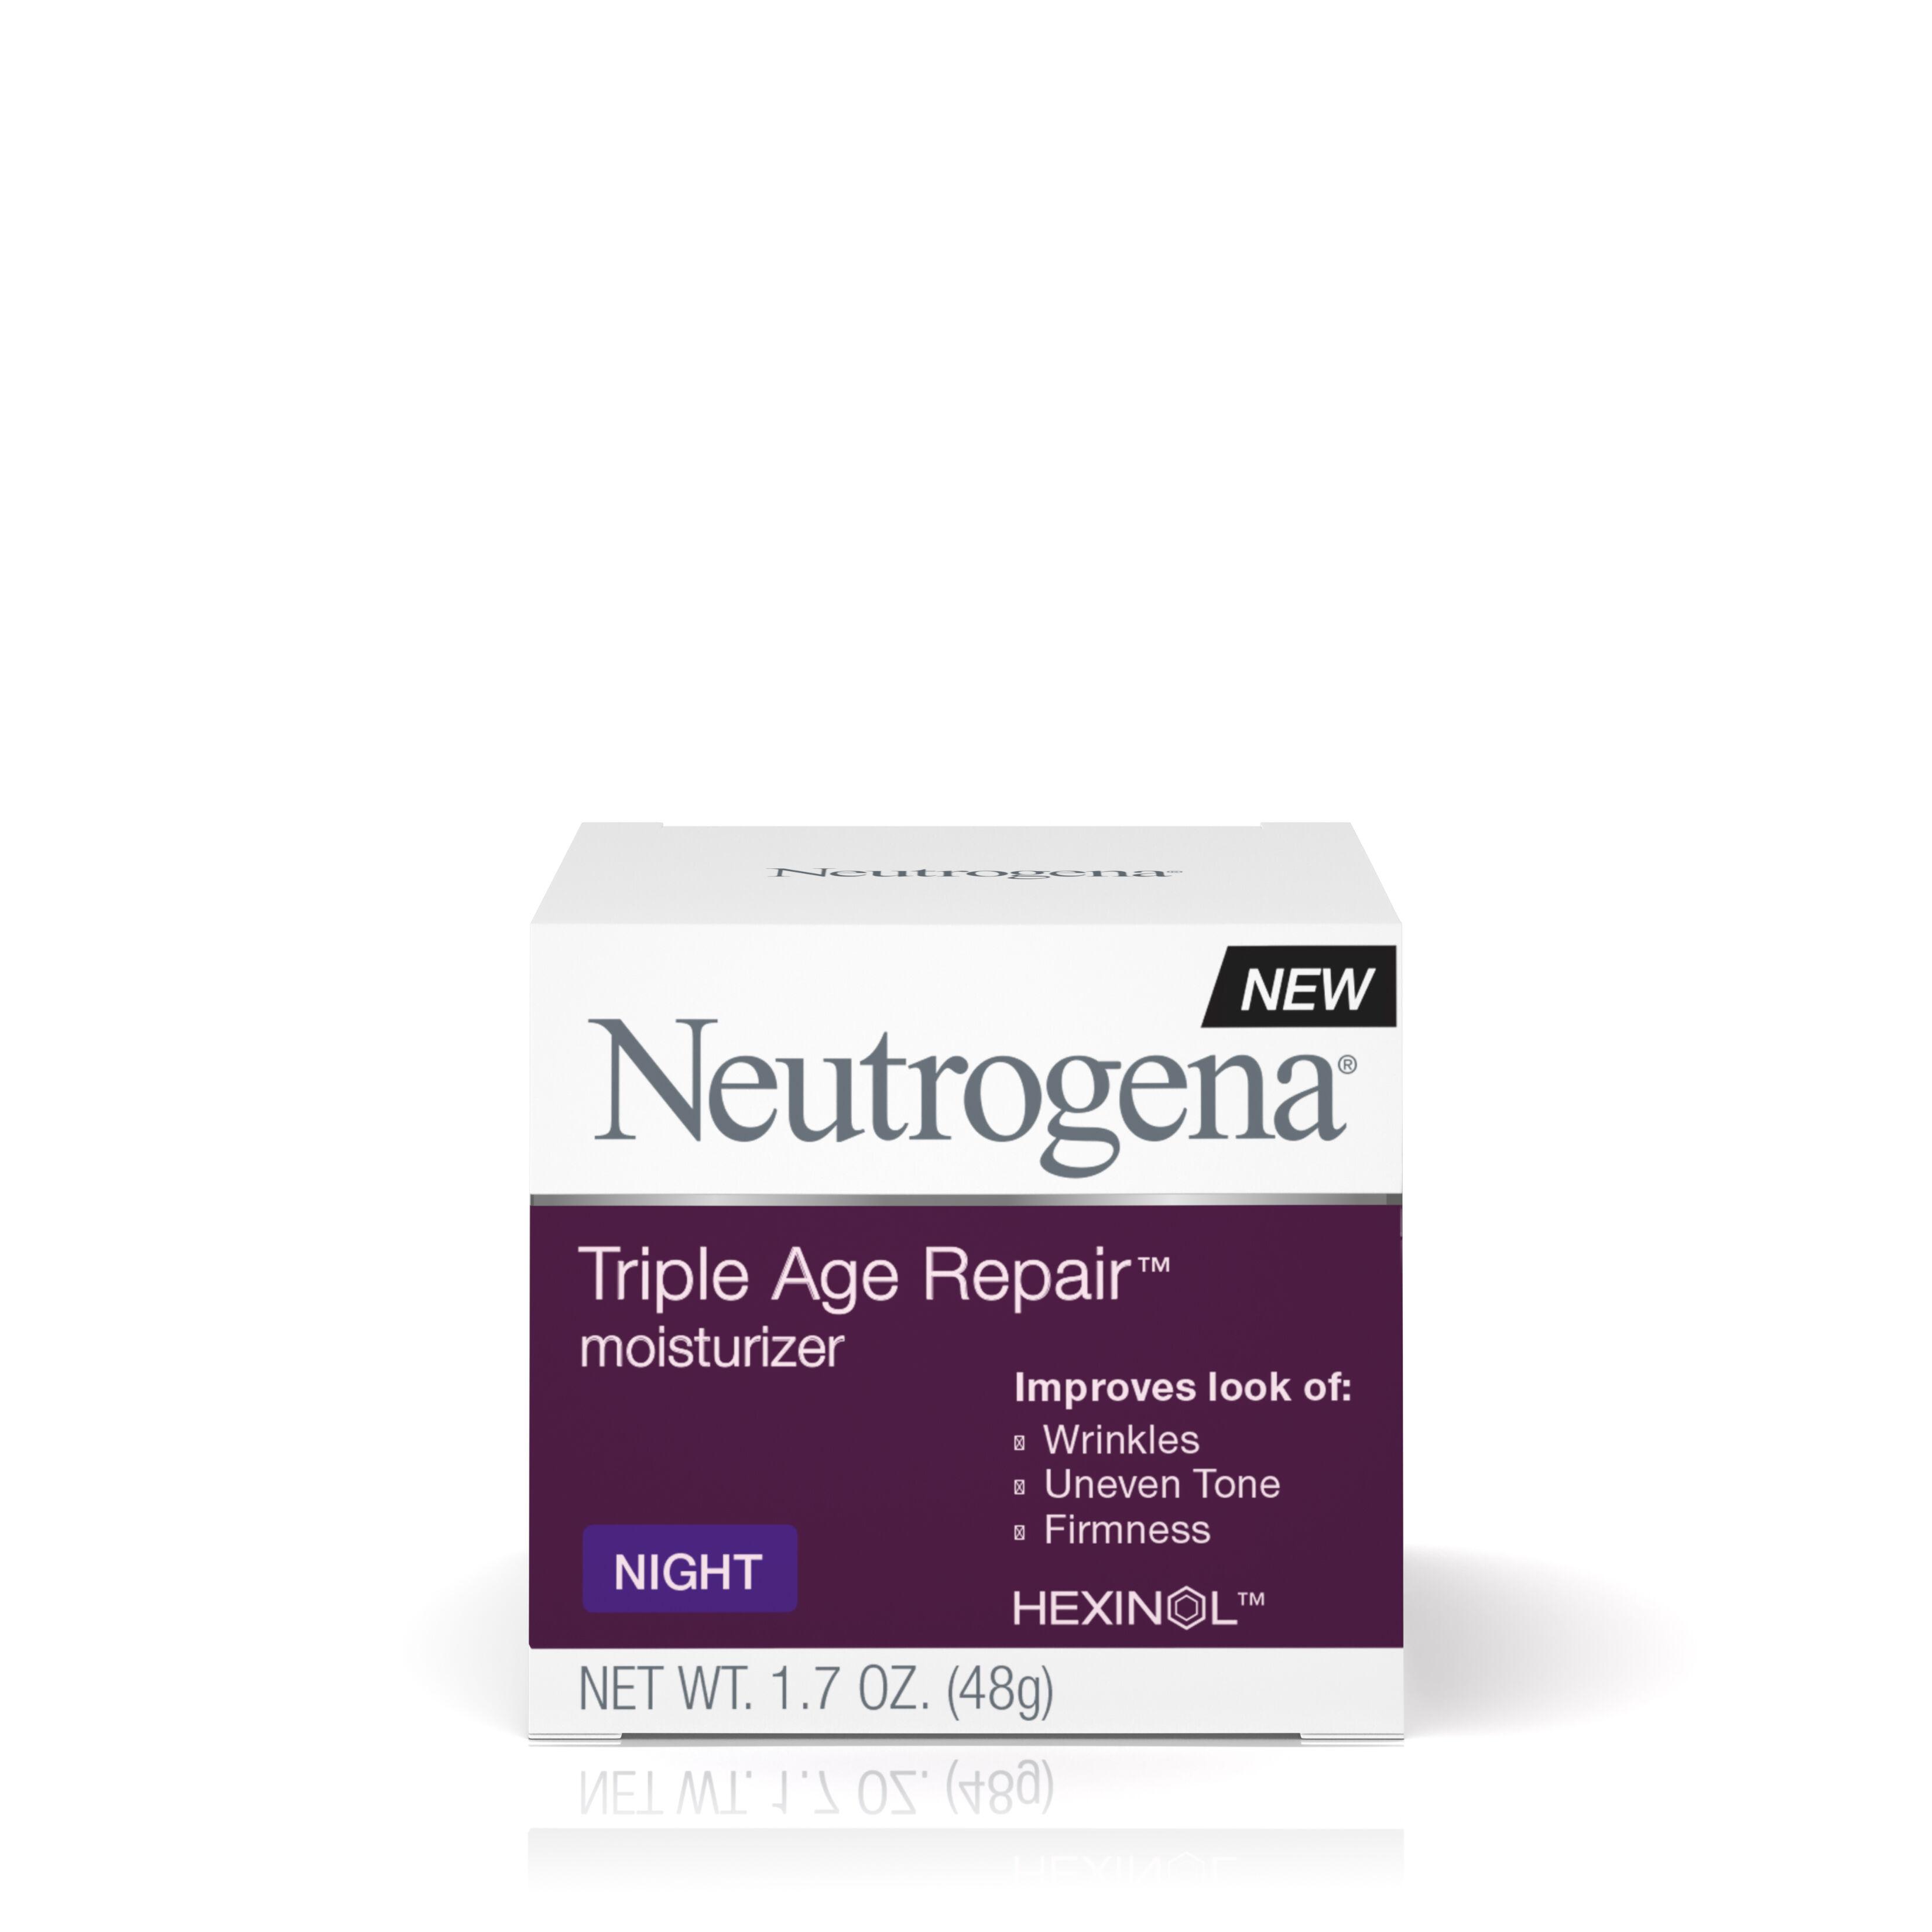 Neutrogena Triple Age Repair Moisturizer Night Cream  - 1.7 Oz, 3 Pack Neck Firming moisturizing lotion - restore the elasticity on your skin (120ml)